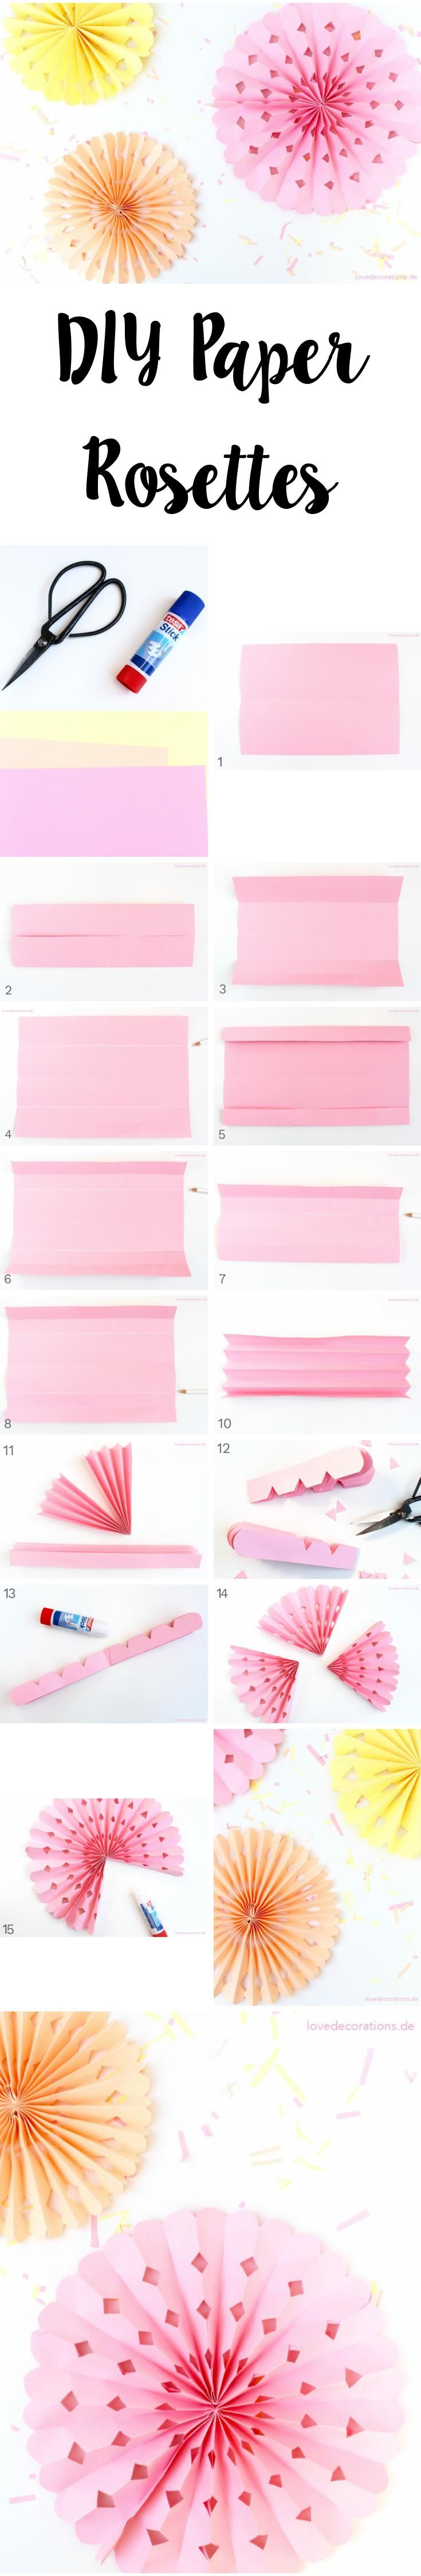 DIY Faltrosetten   DIY Paper Rosettes